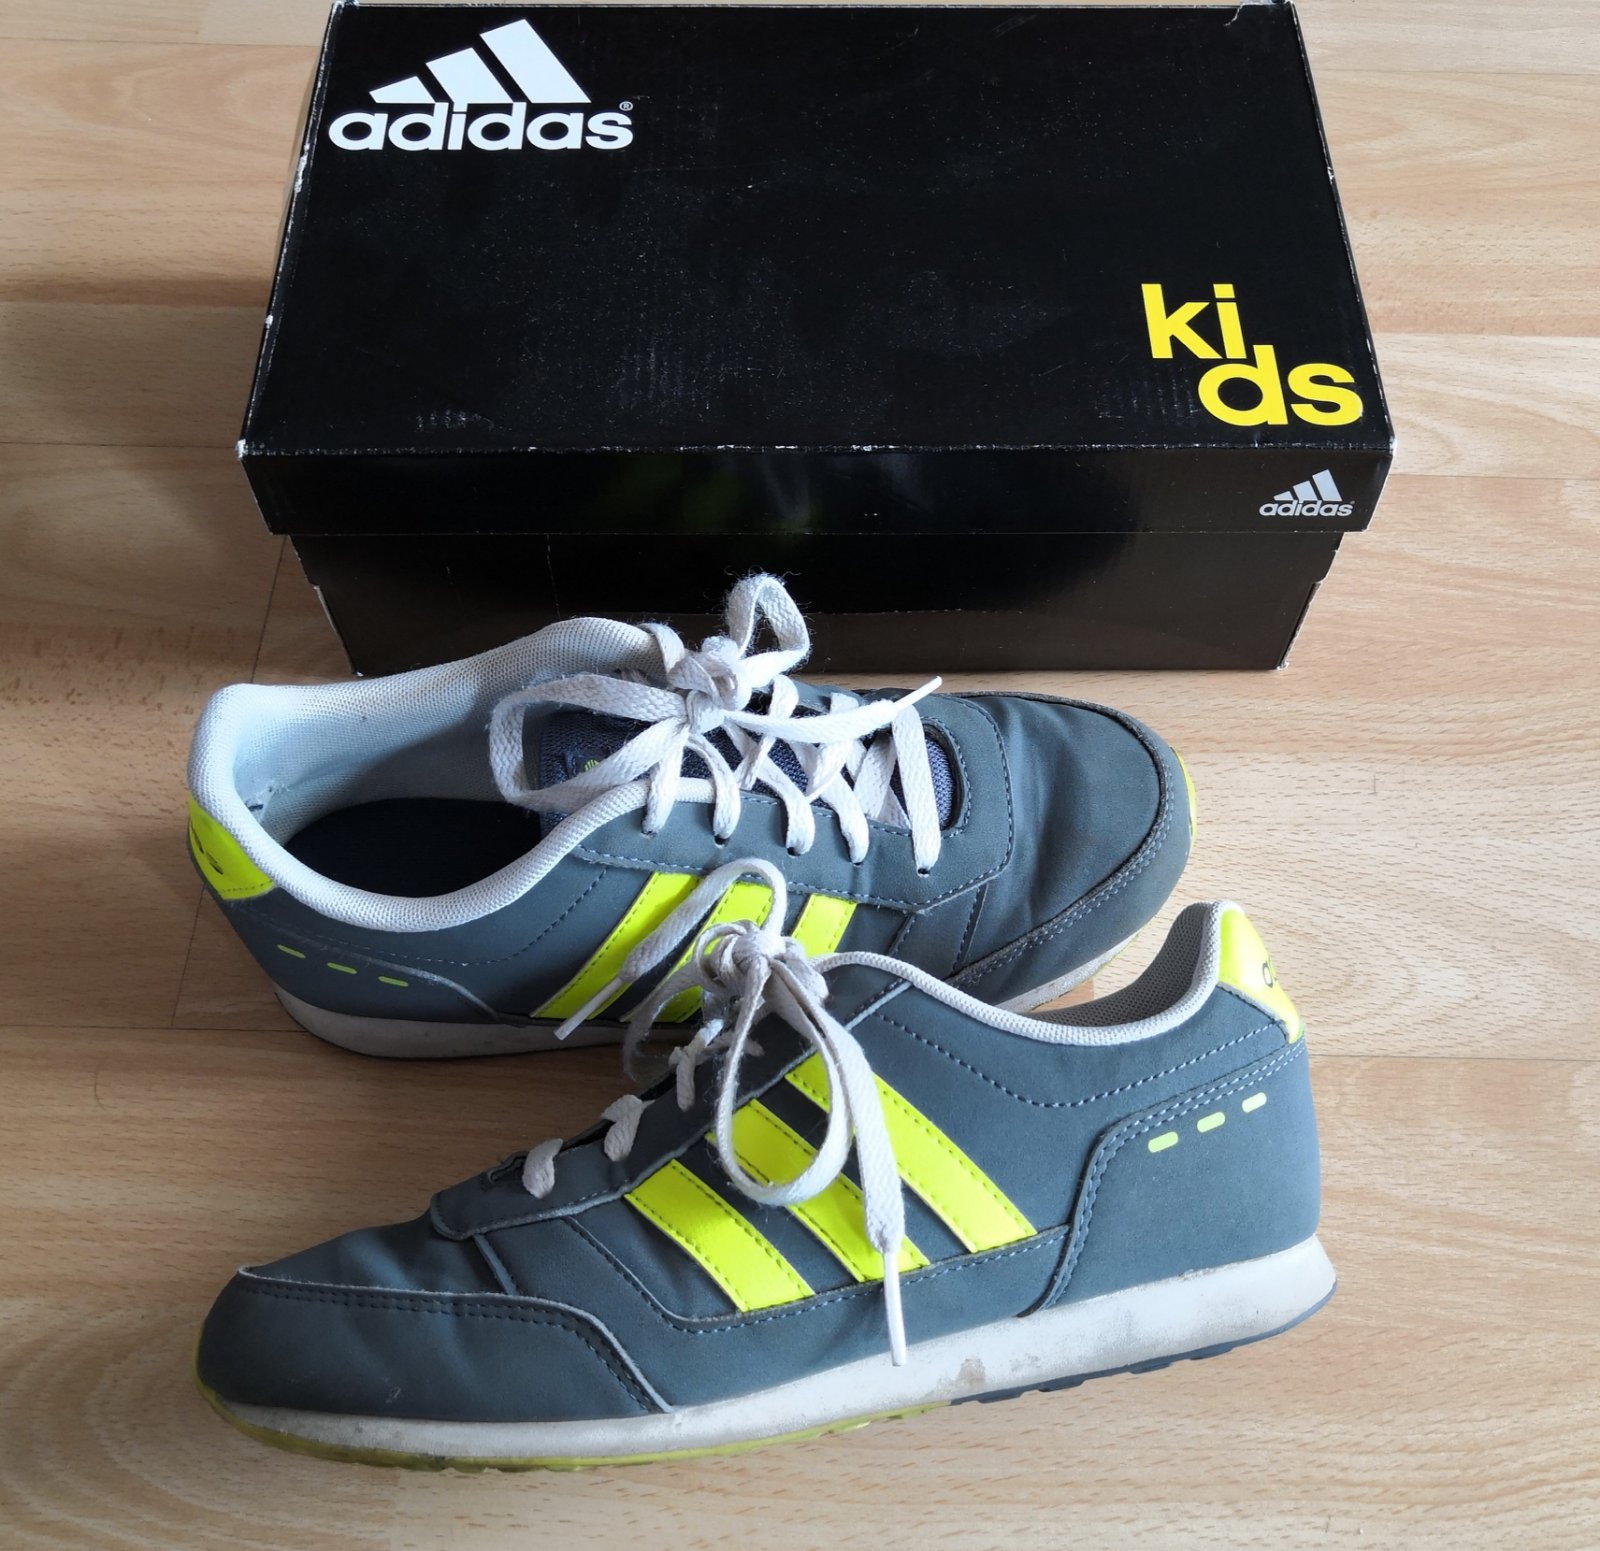 Boty & tenisky adidas vel. 35, adidas,35 - 255 Kč Od ...